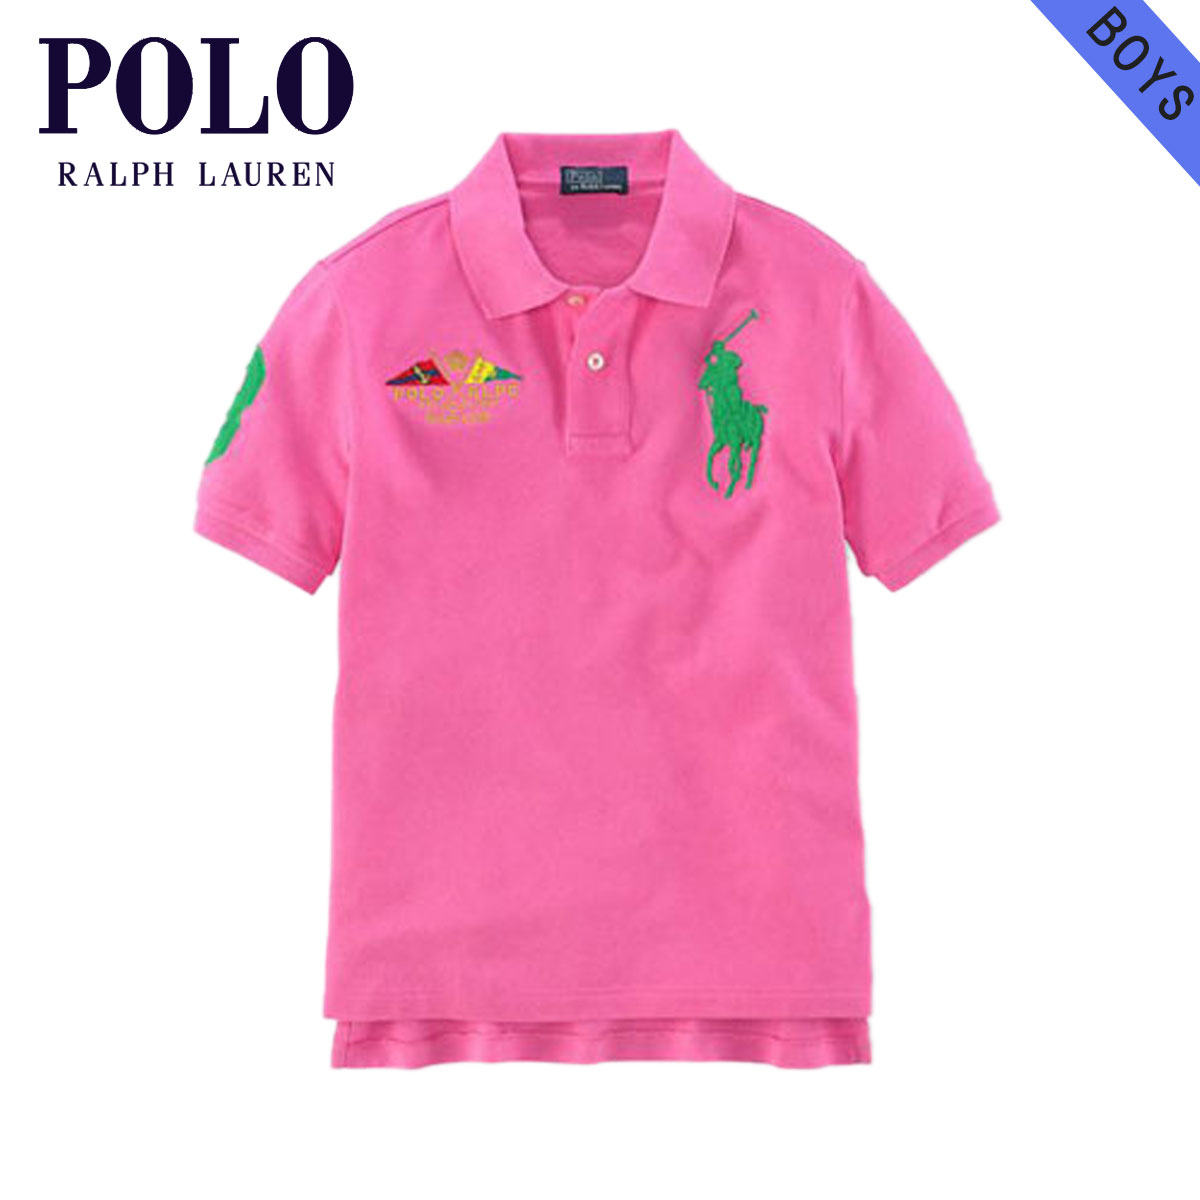 9628fc0c Rakuten Ichiba shop MIXON: Polo Ralph Lauren kids POLO RALPH LAUREN  CHILDREN regular article children's clothes Boys polo shirt Big Pony Flag  Polo #18121136 ...